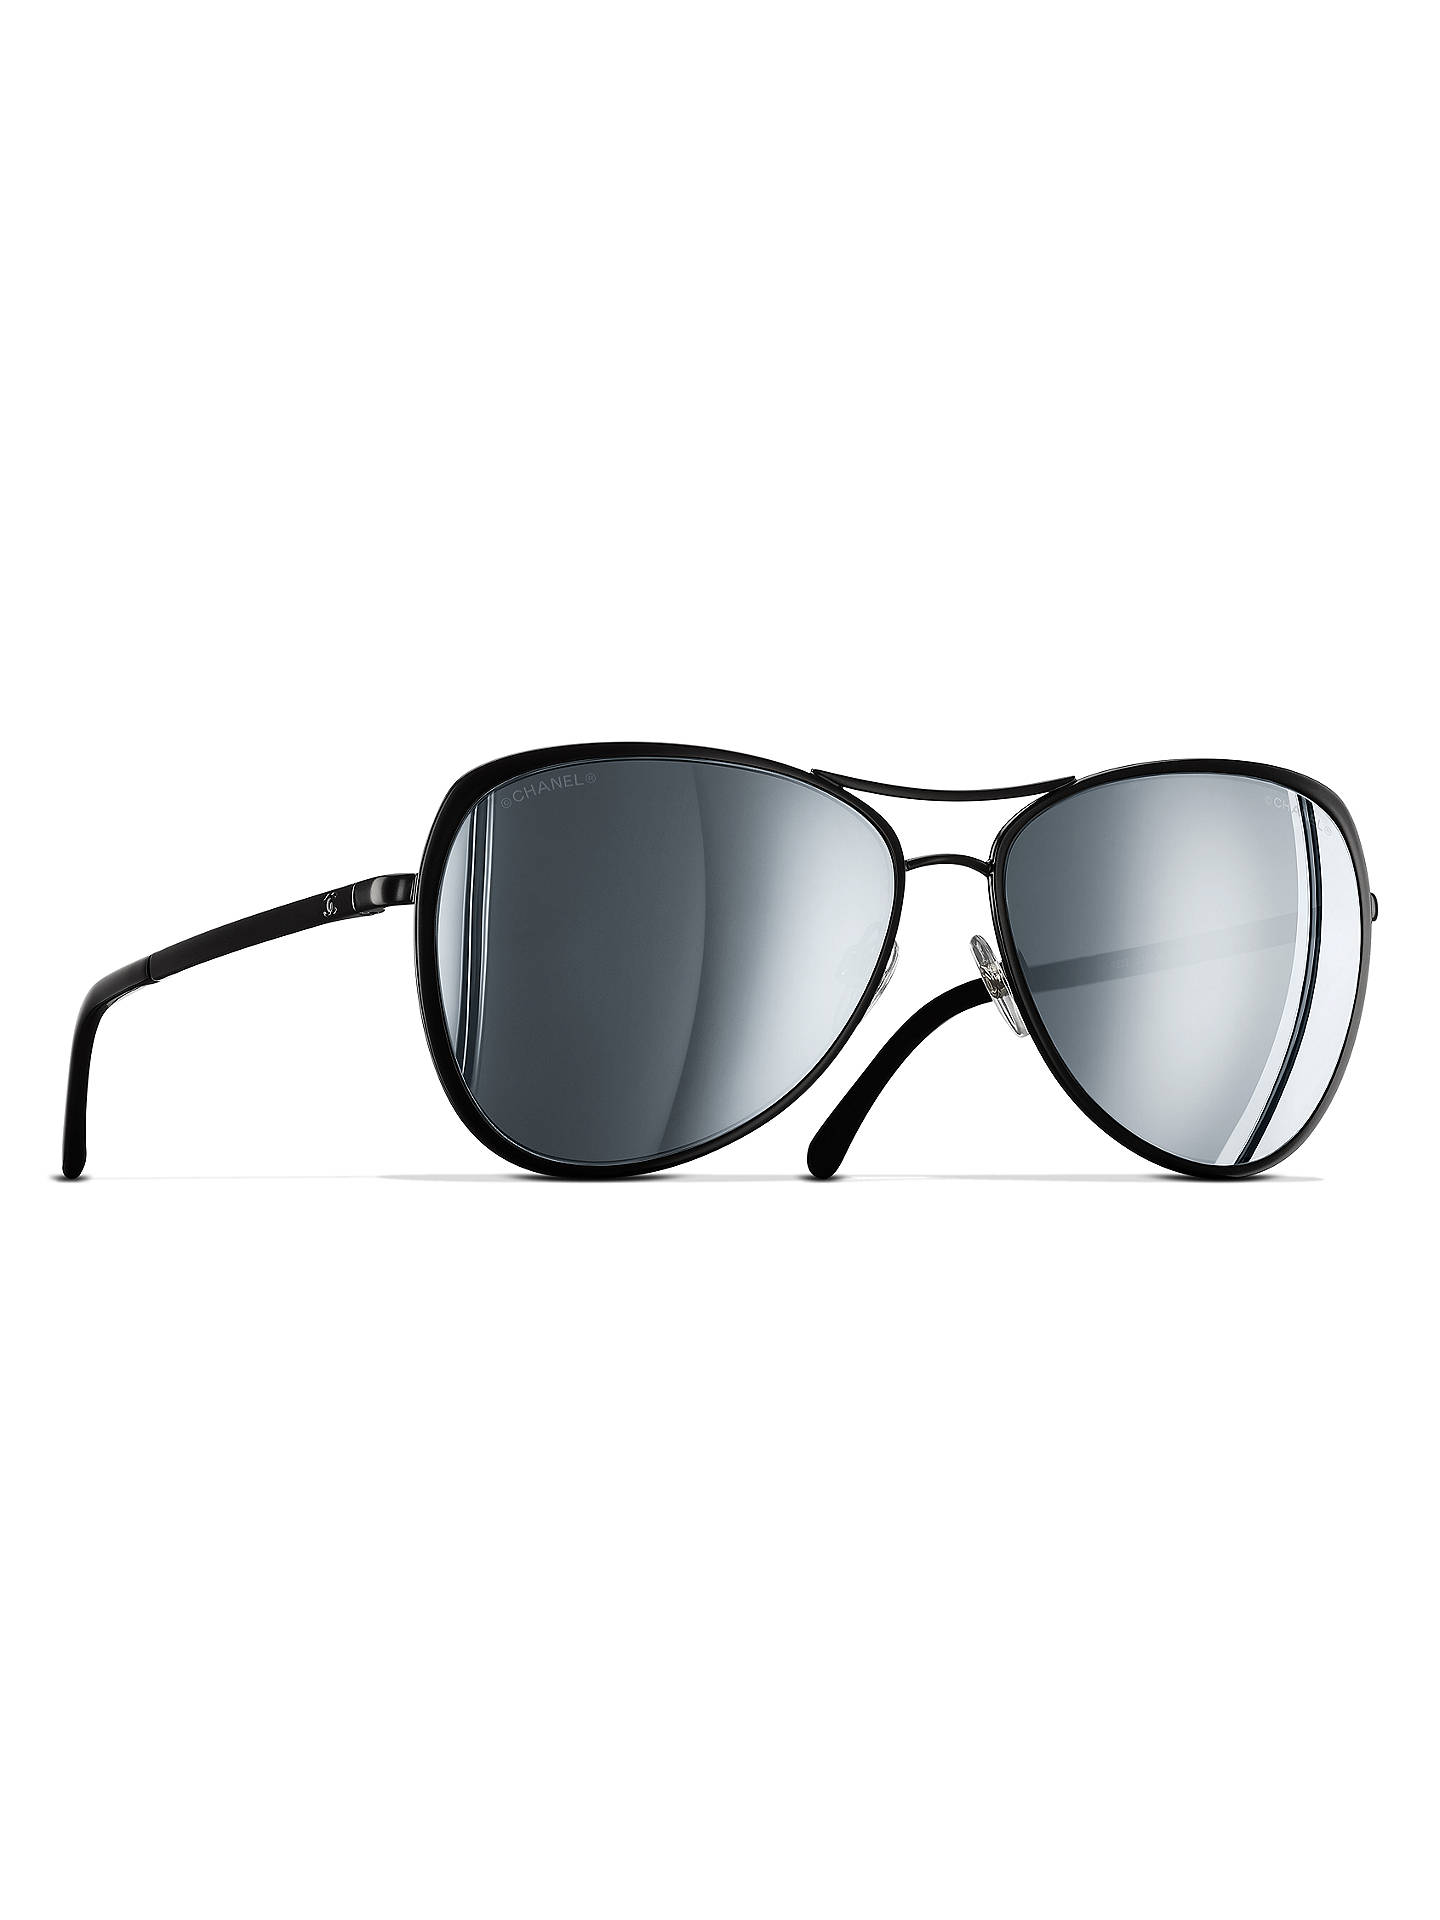 f6a9fc35b5 BuyCHANEL Pilot Sunglasses CH4223 Black Online at johnlewis.com ...